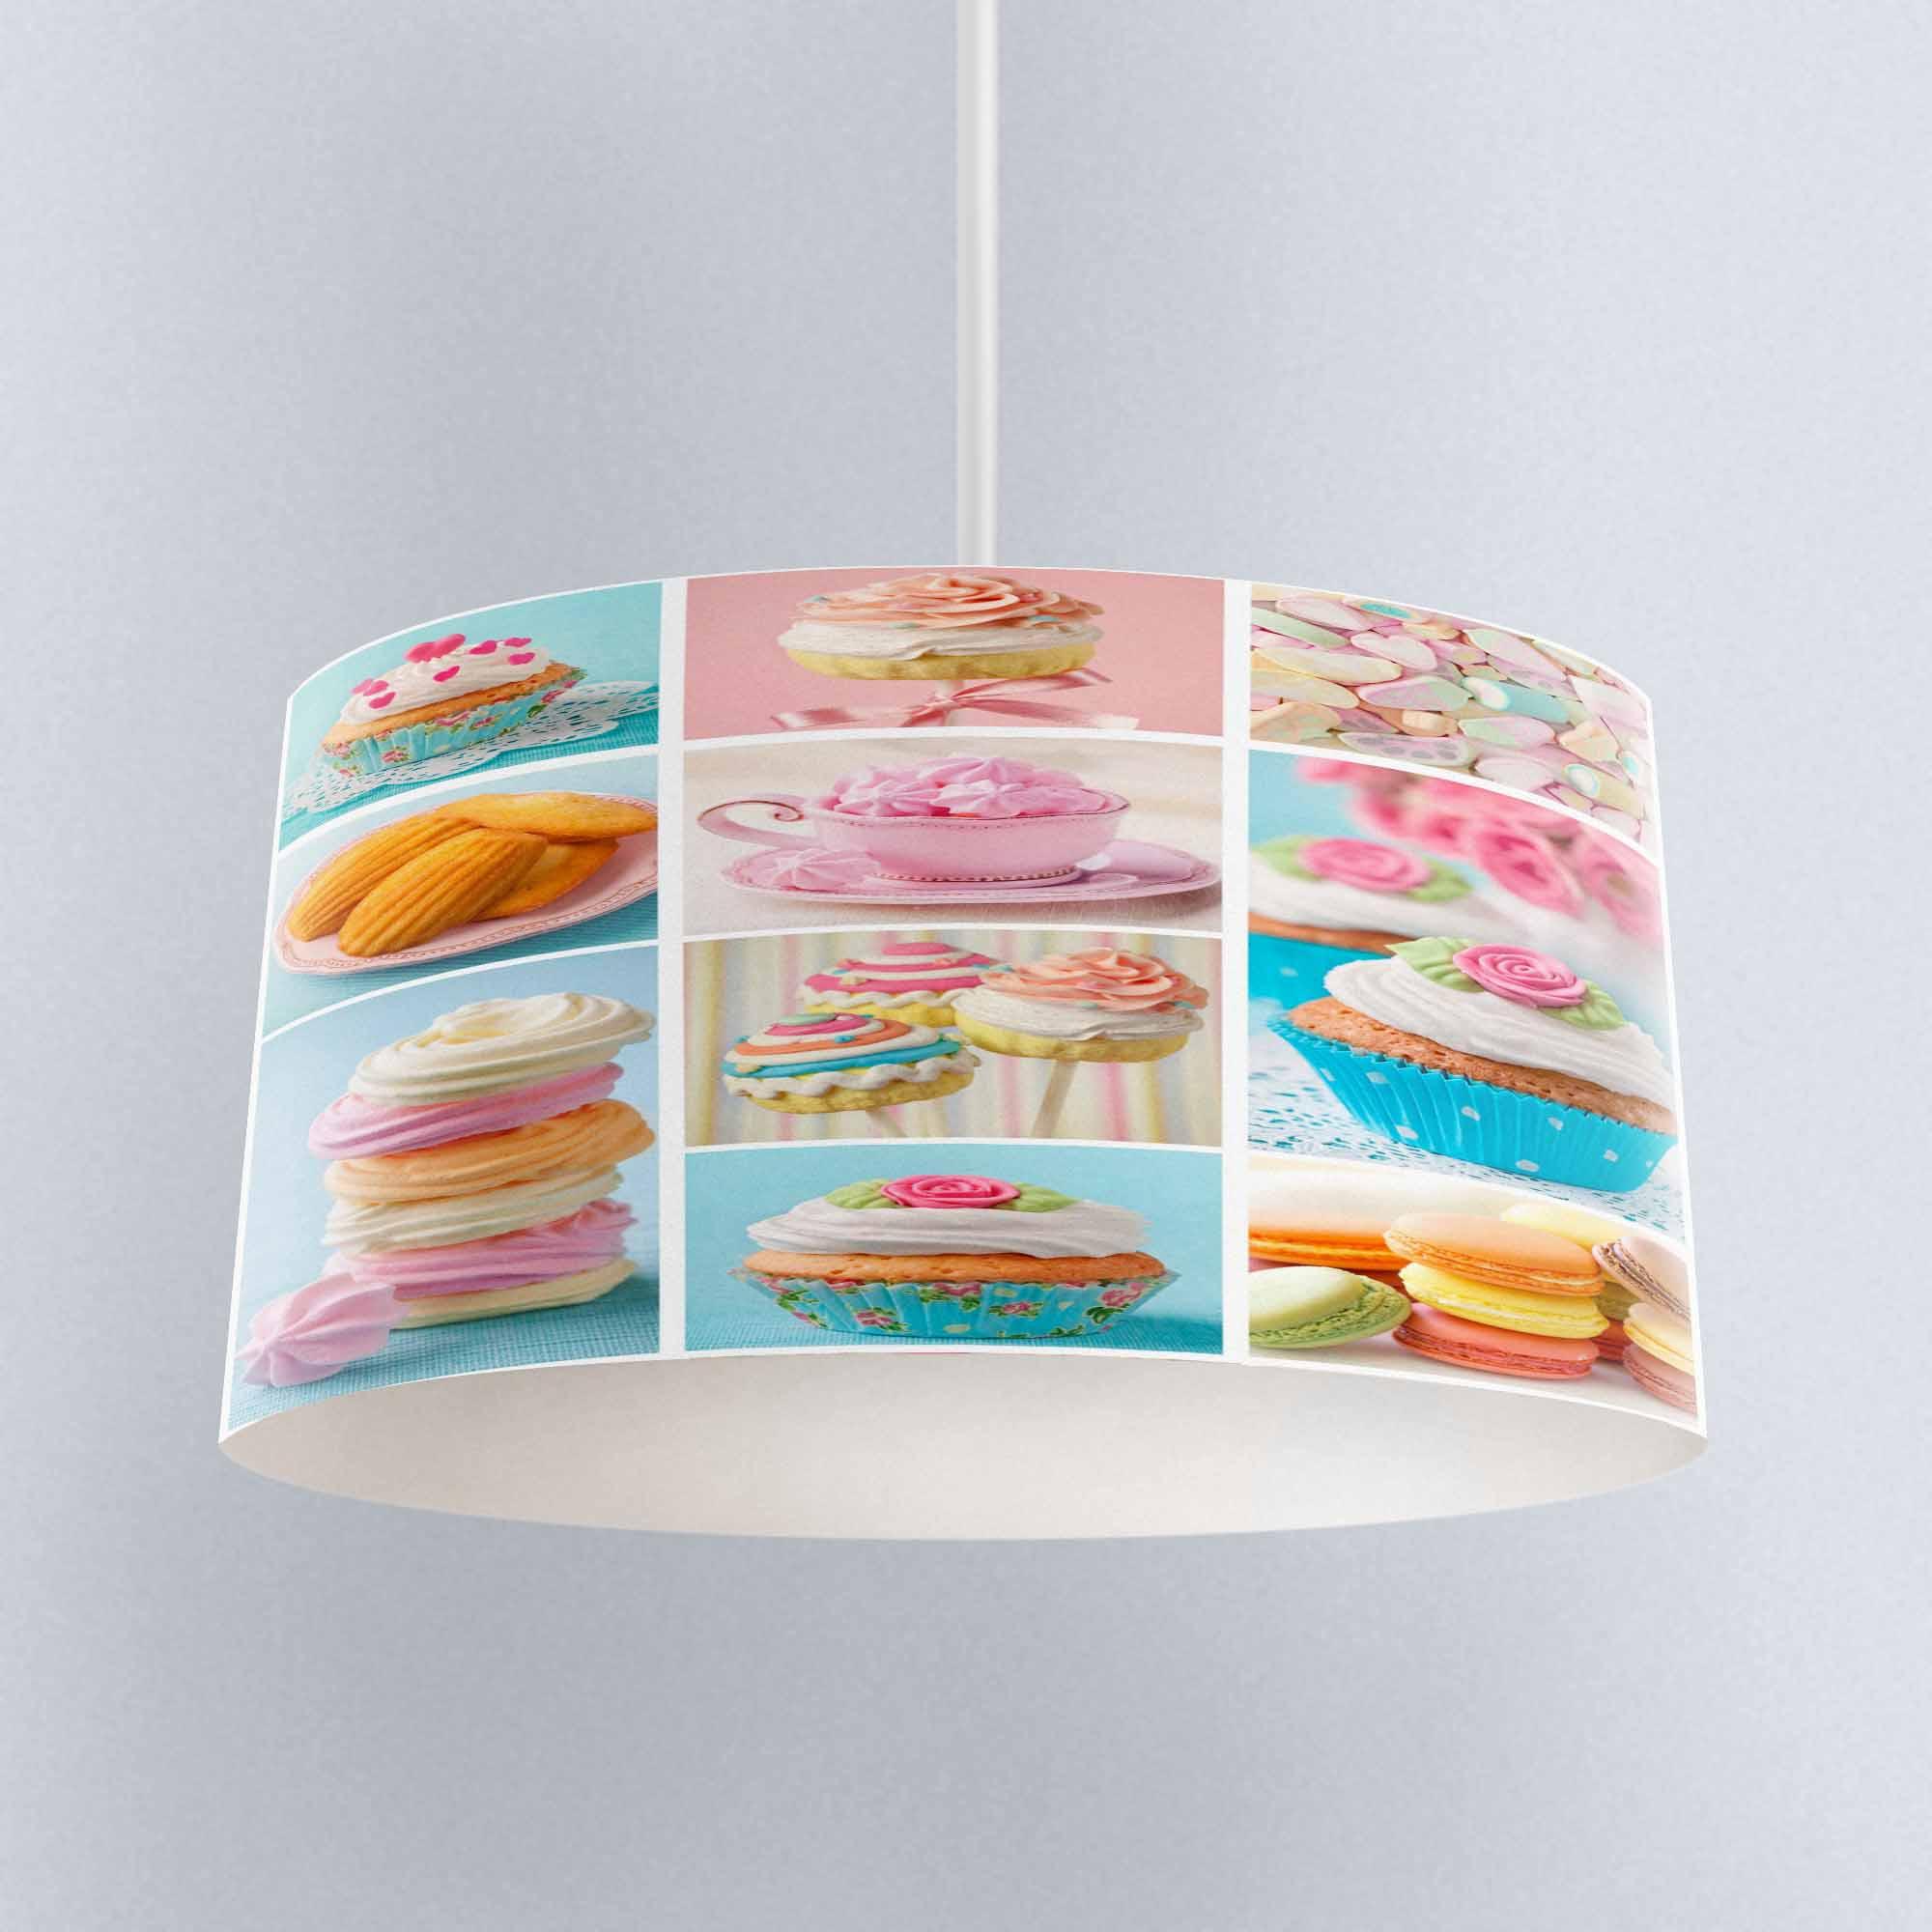 Else azul Rosa taza pasteles de tela de retales impreso lámpara de araña de cocina Pantalla de tambor piso techo colgante sombra de luz